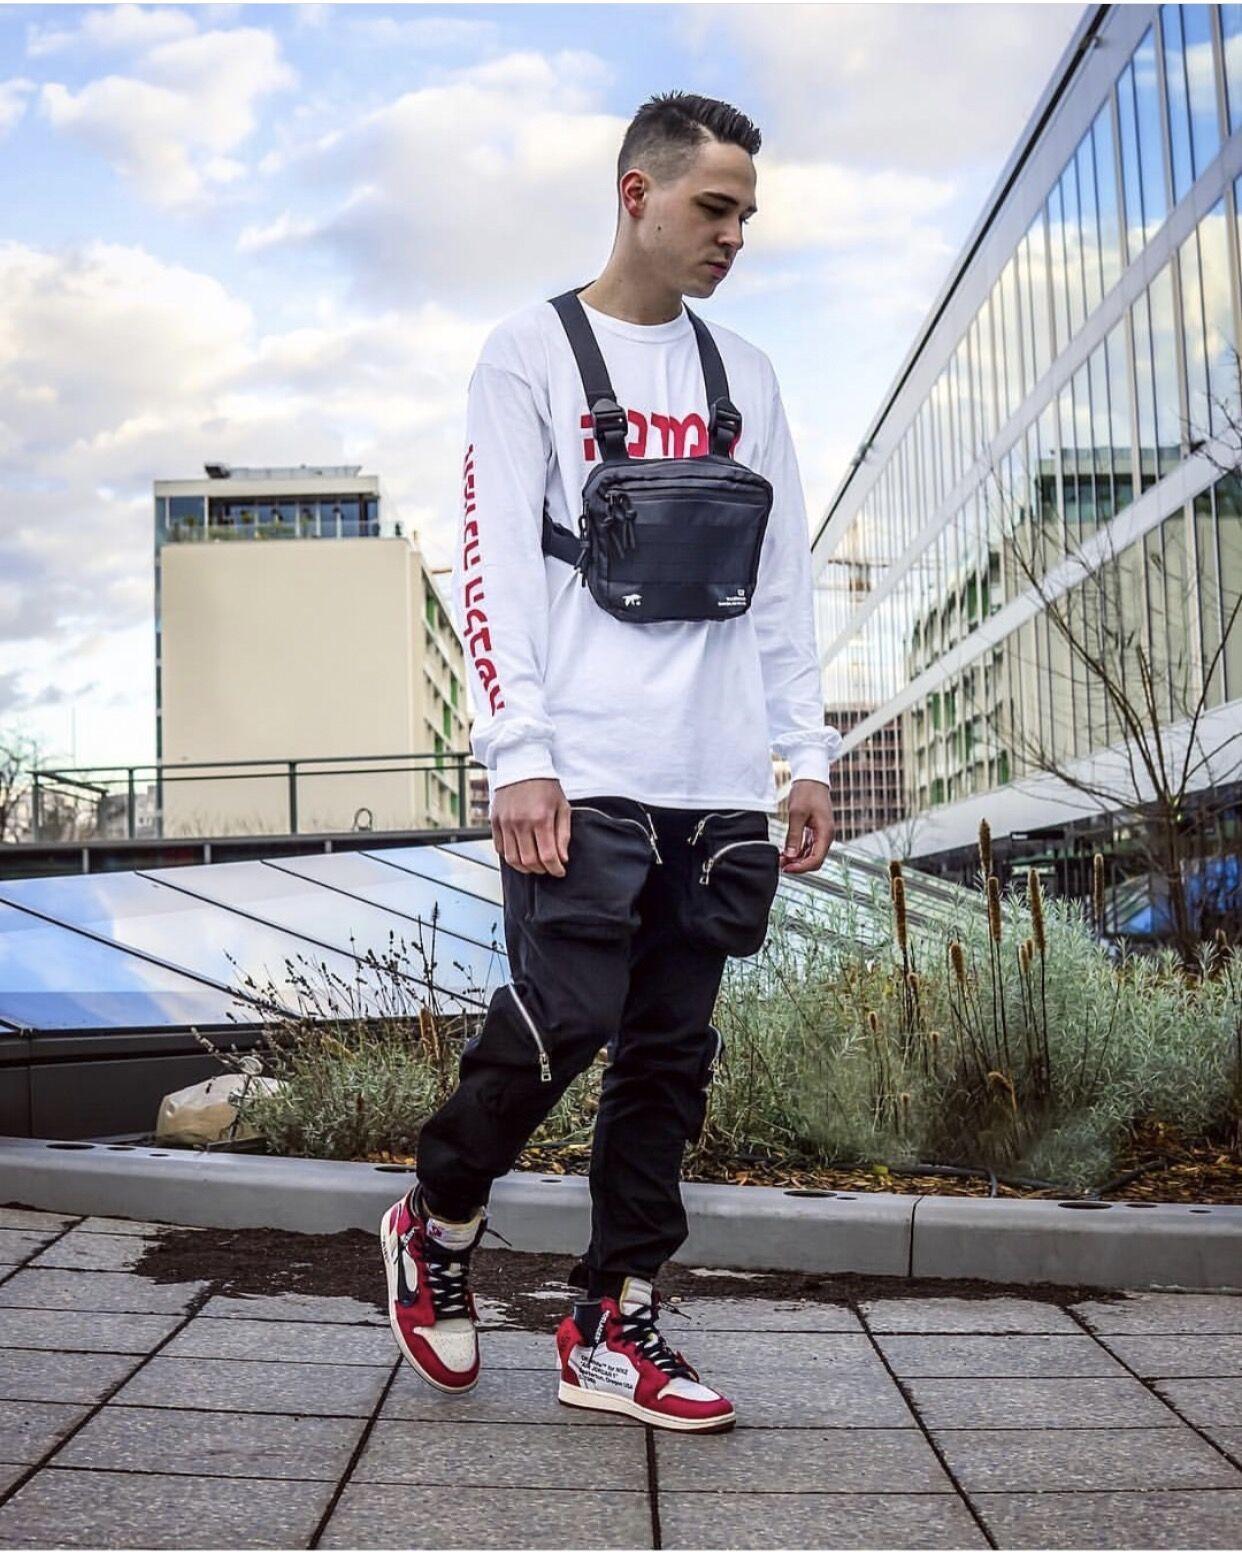 Hypebeast cargo pants  Mens fashion streetwear, Hypebeast outfit